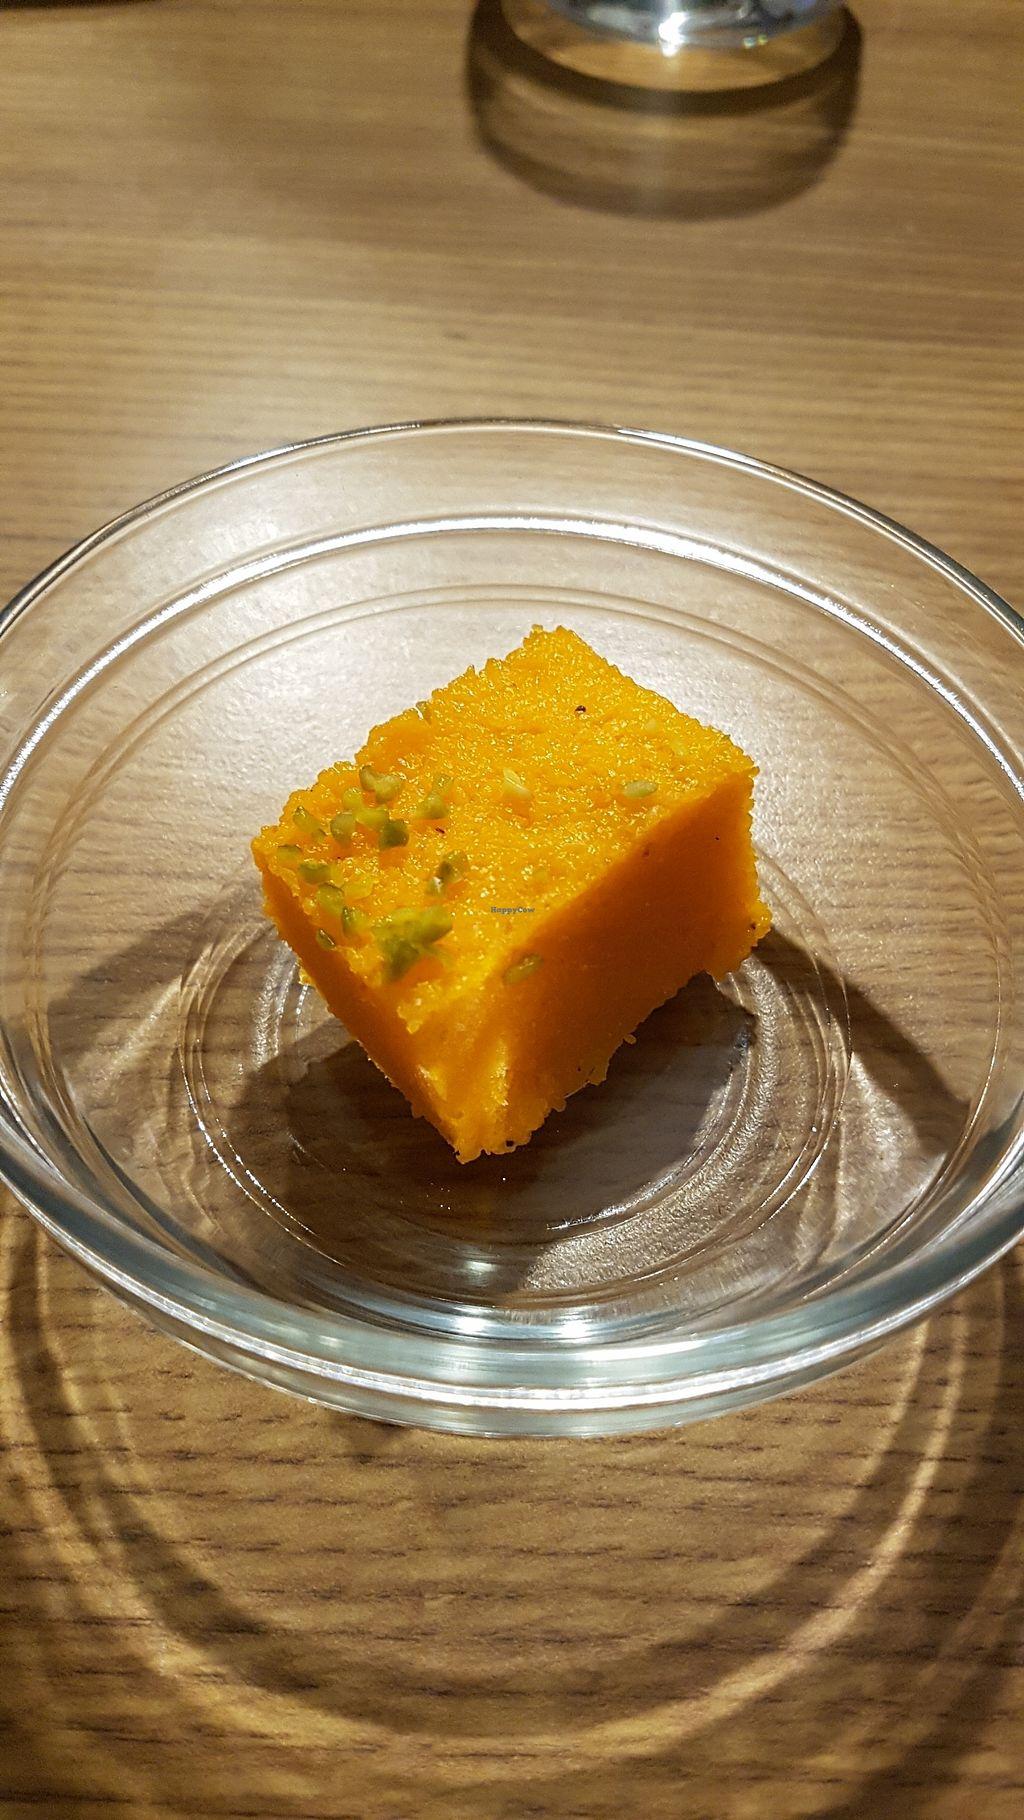 "Photo of Lunch Box  by <a href=""/members/profile/JonJon"">JonJon</a> <br/>Semolina cake <br/> February 11, 2018  - <a href='/contact/abuse/image/111600/358053'>Report</a>"